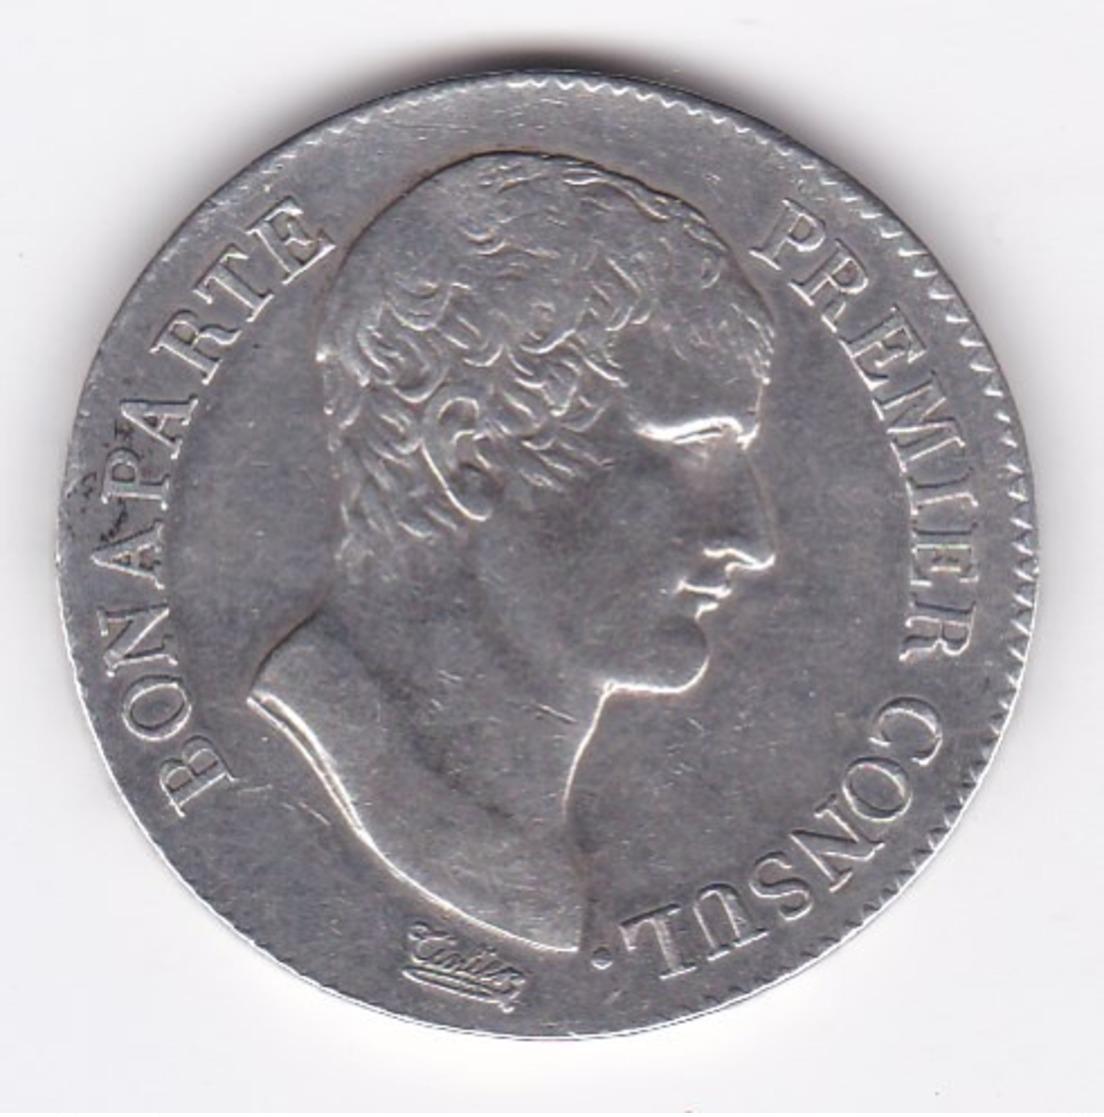 MONNAIE FRANCE 5 FRANCS AN XI A NAPOLEON - Francia